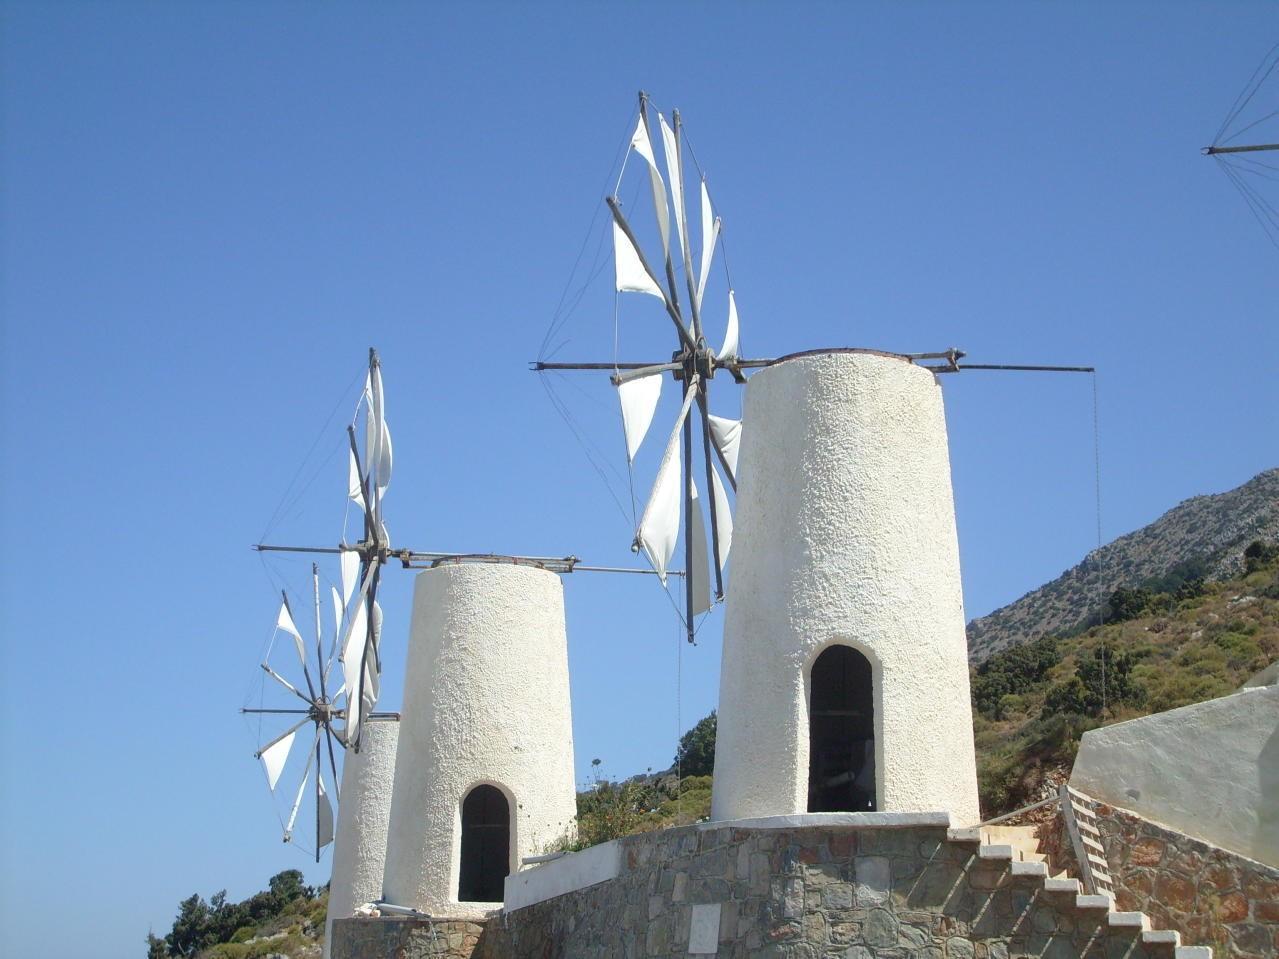 World Beautiful Girl Wallpaper Windmills The Stone Giants Of The Greek Land